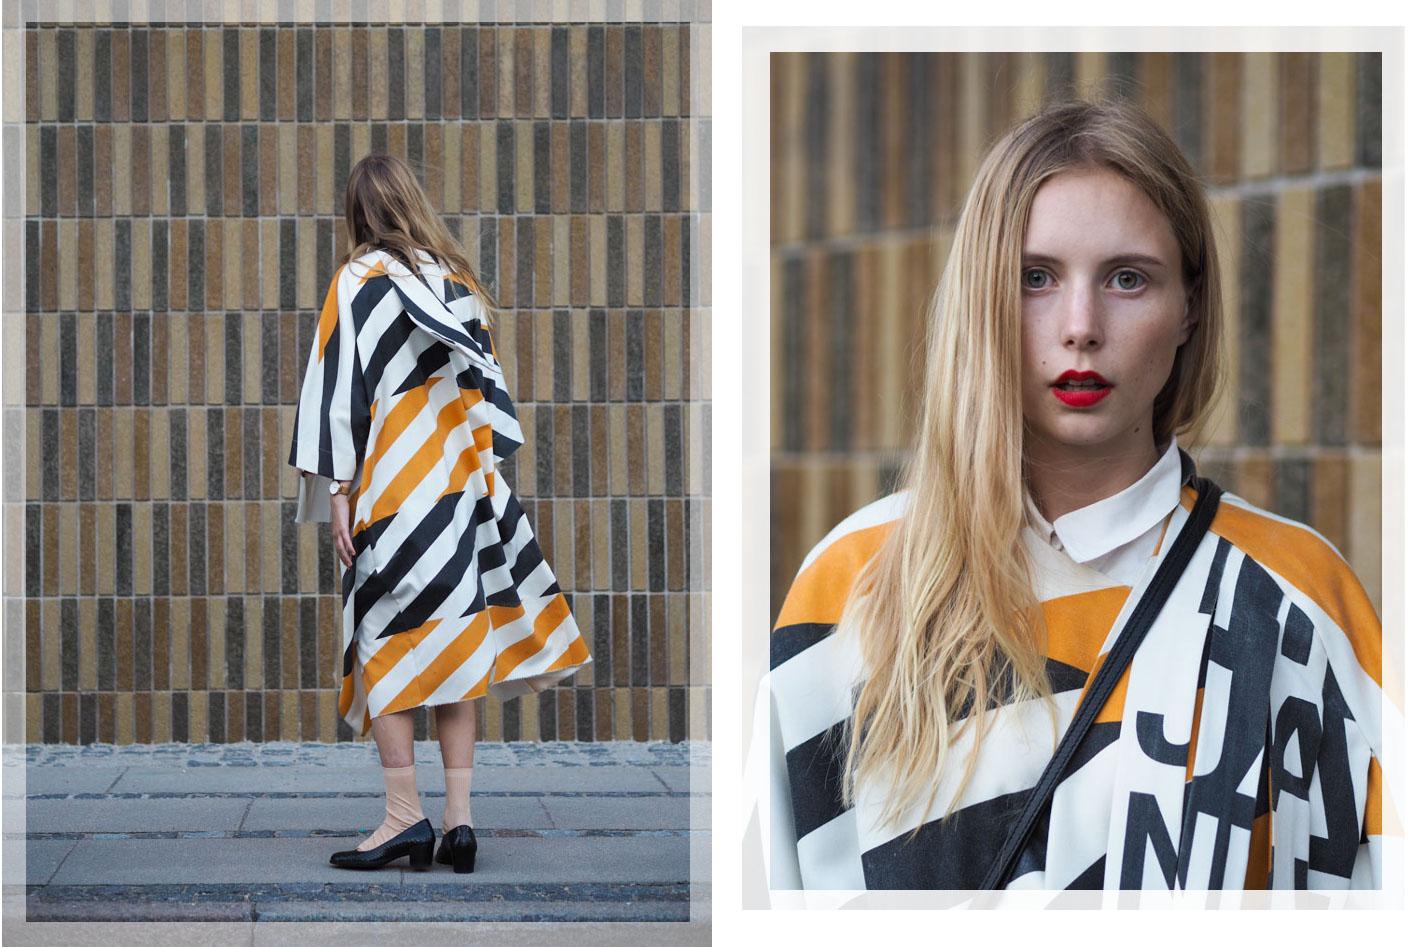 outfit june 16 nemesis babe marie my jensen danish blogger fashion week henrik vibskov-7coll2